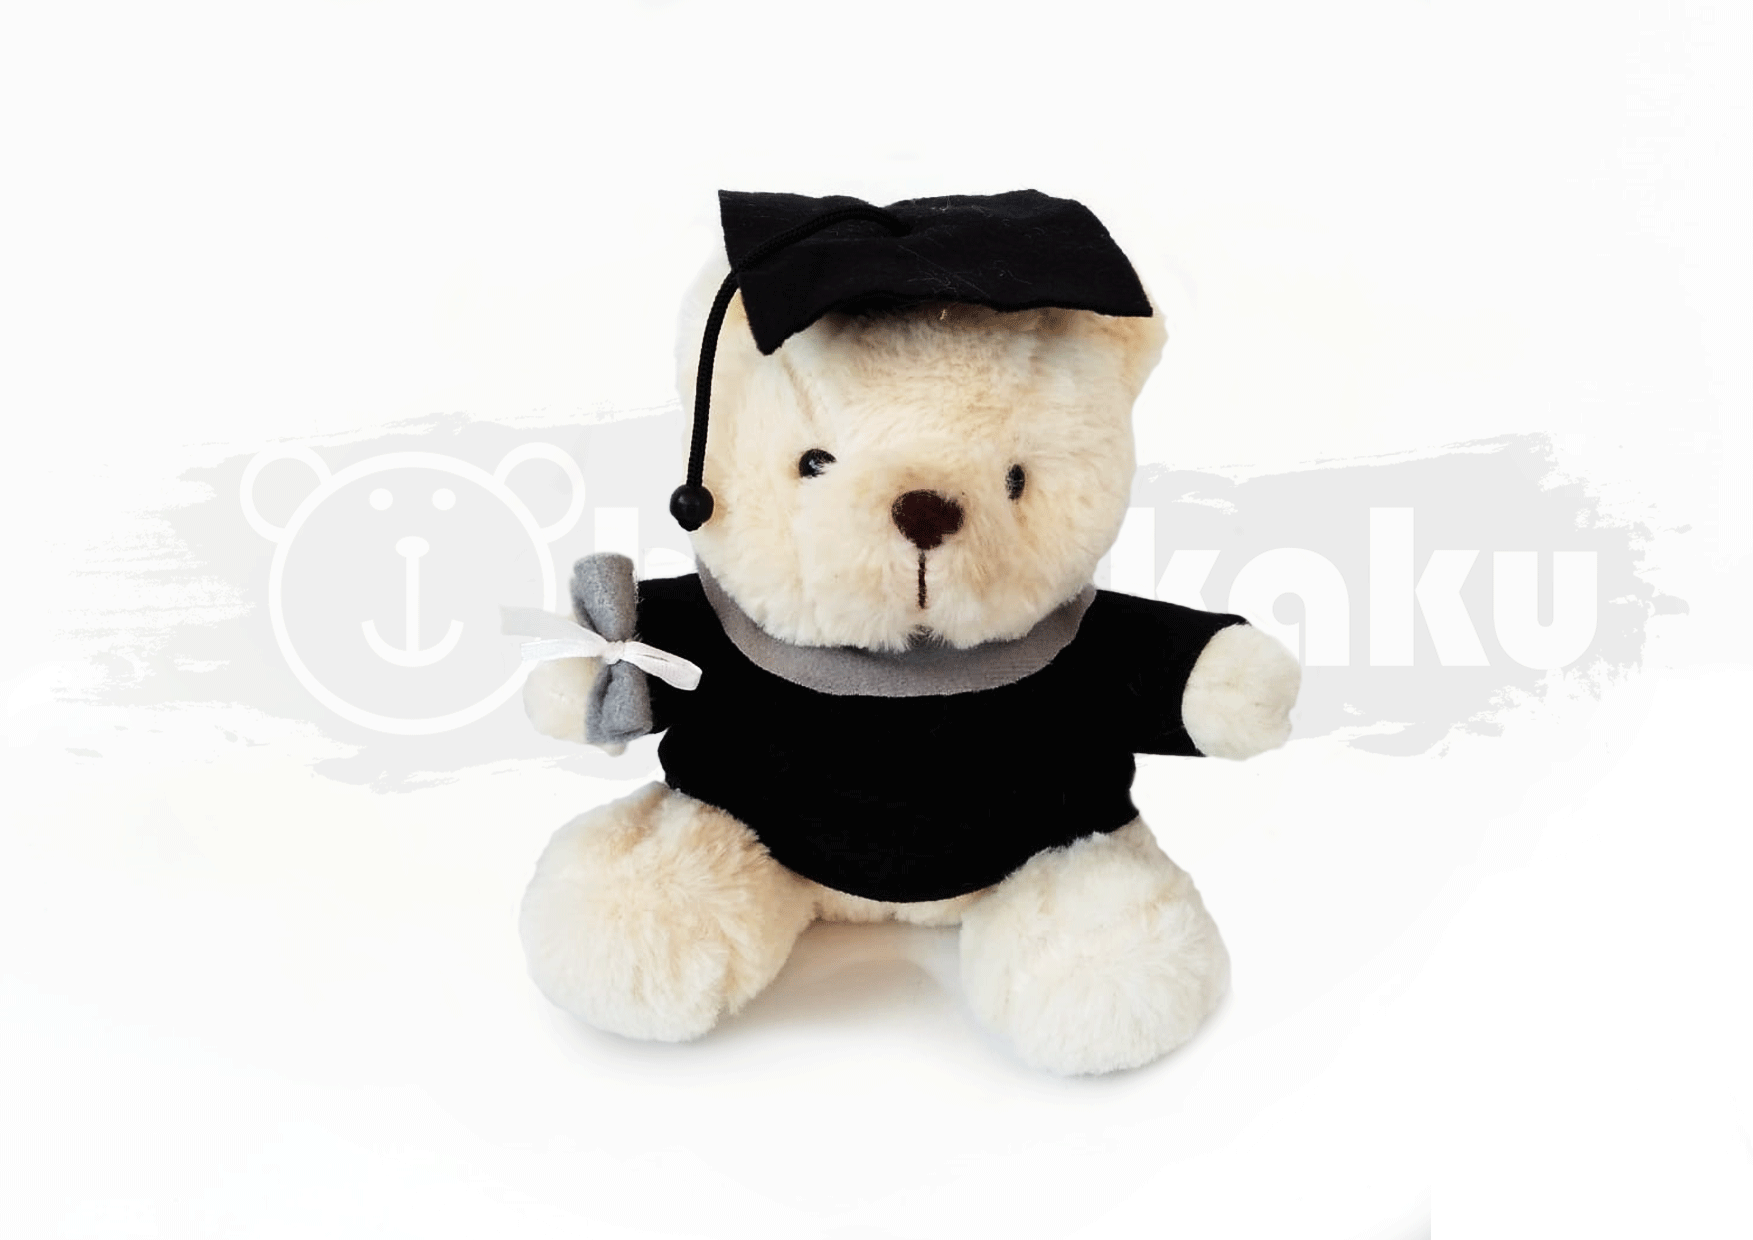 Graduation series - Bobby/Bonnie Image